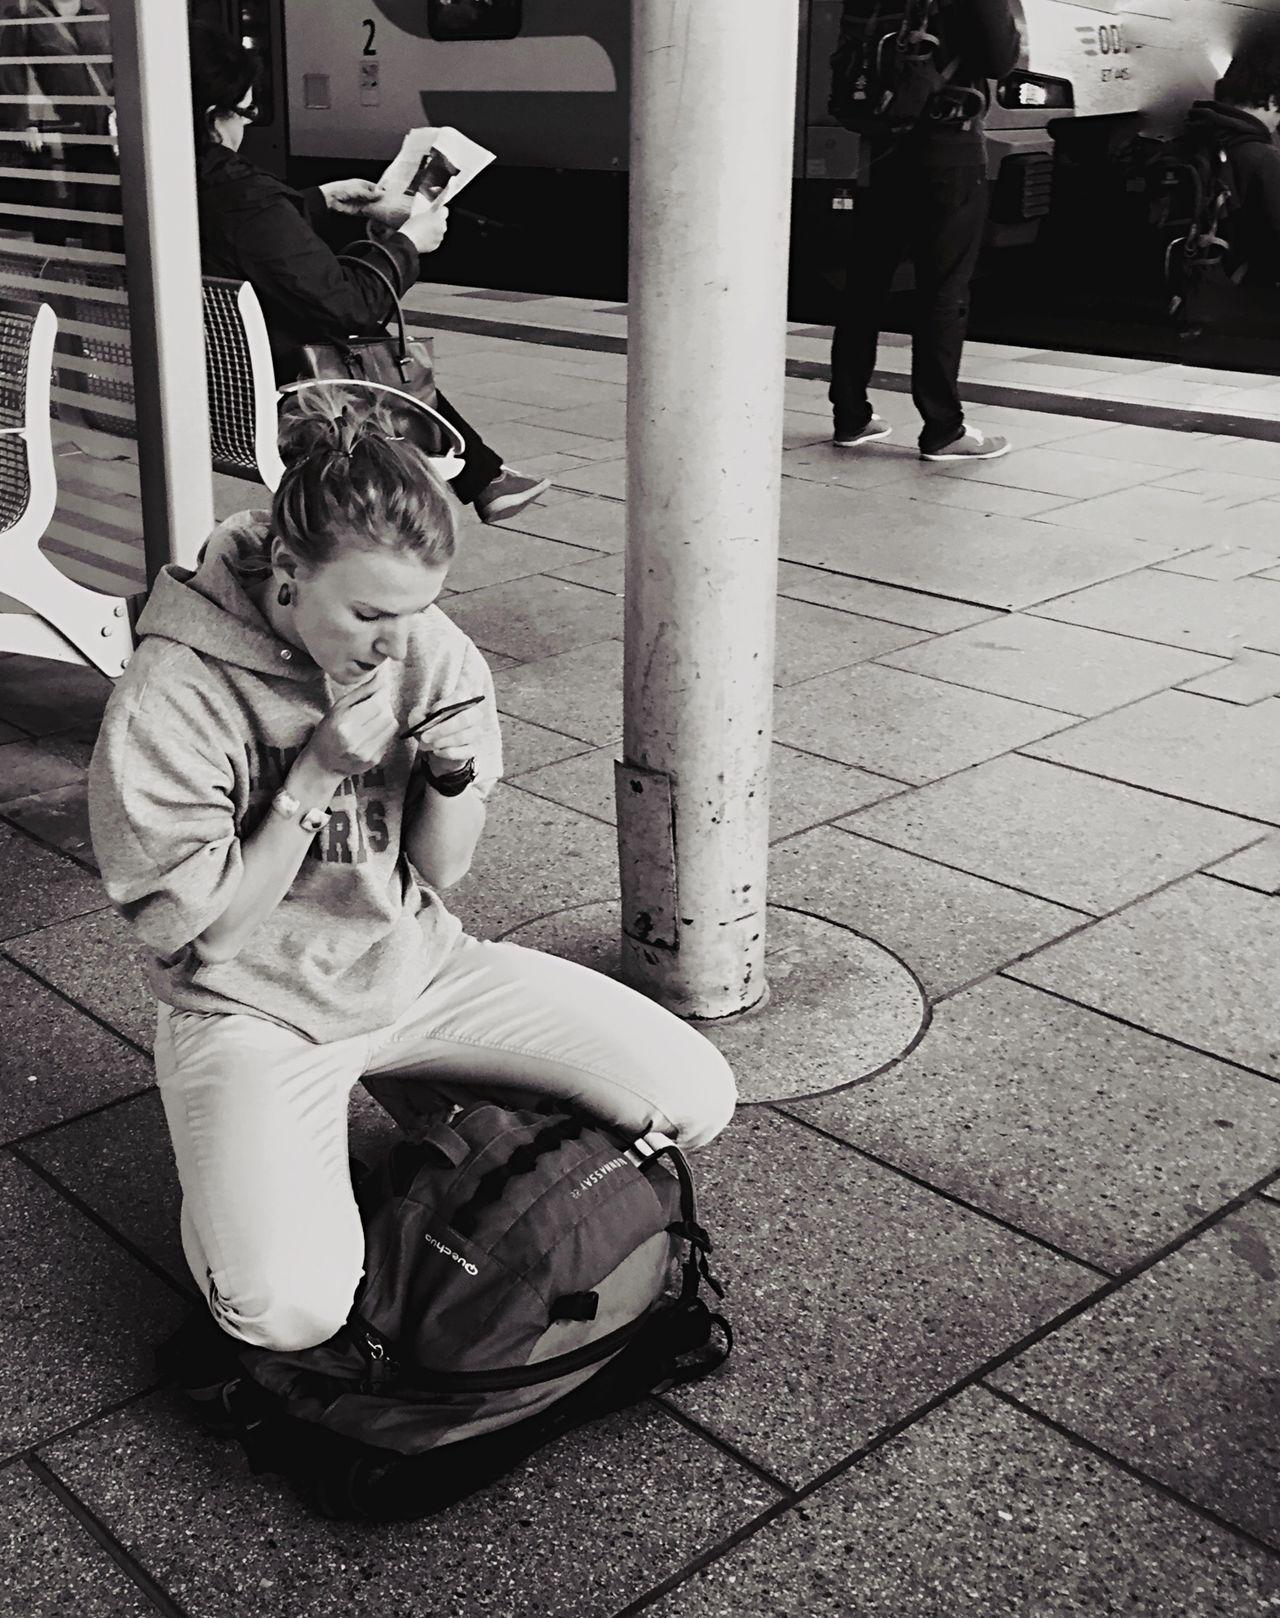 Streetphotography Mpro Blackandwhite Open Edit Berlin Mobilephotography.de The Street Photographer - 2015 EyeEm Awards Shades Of Grey